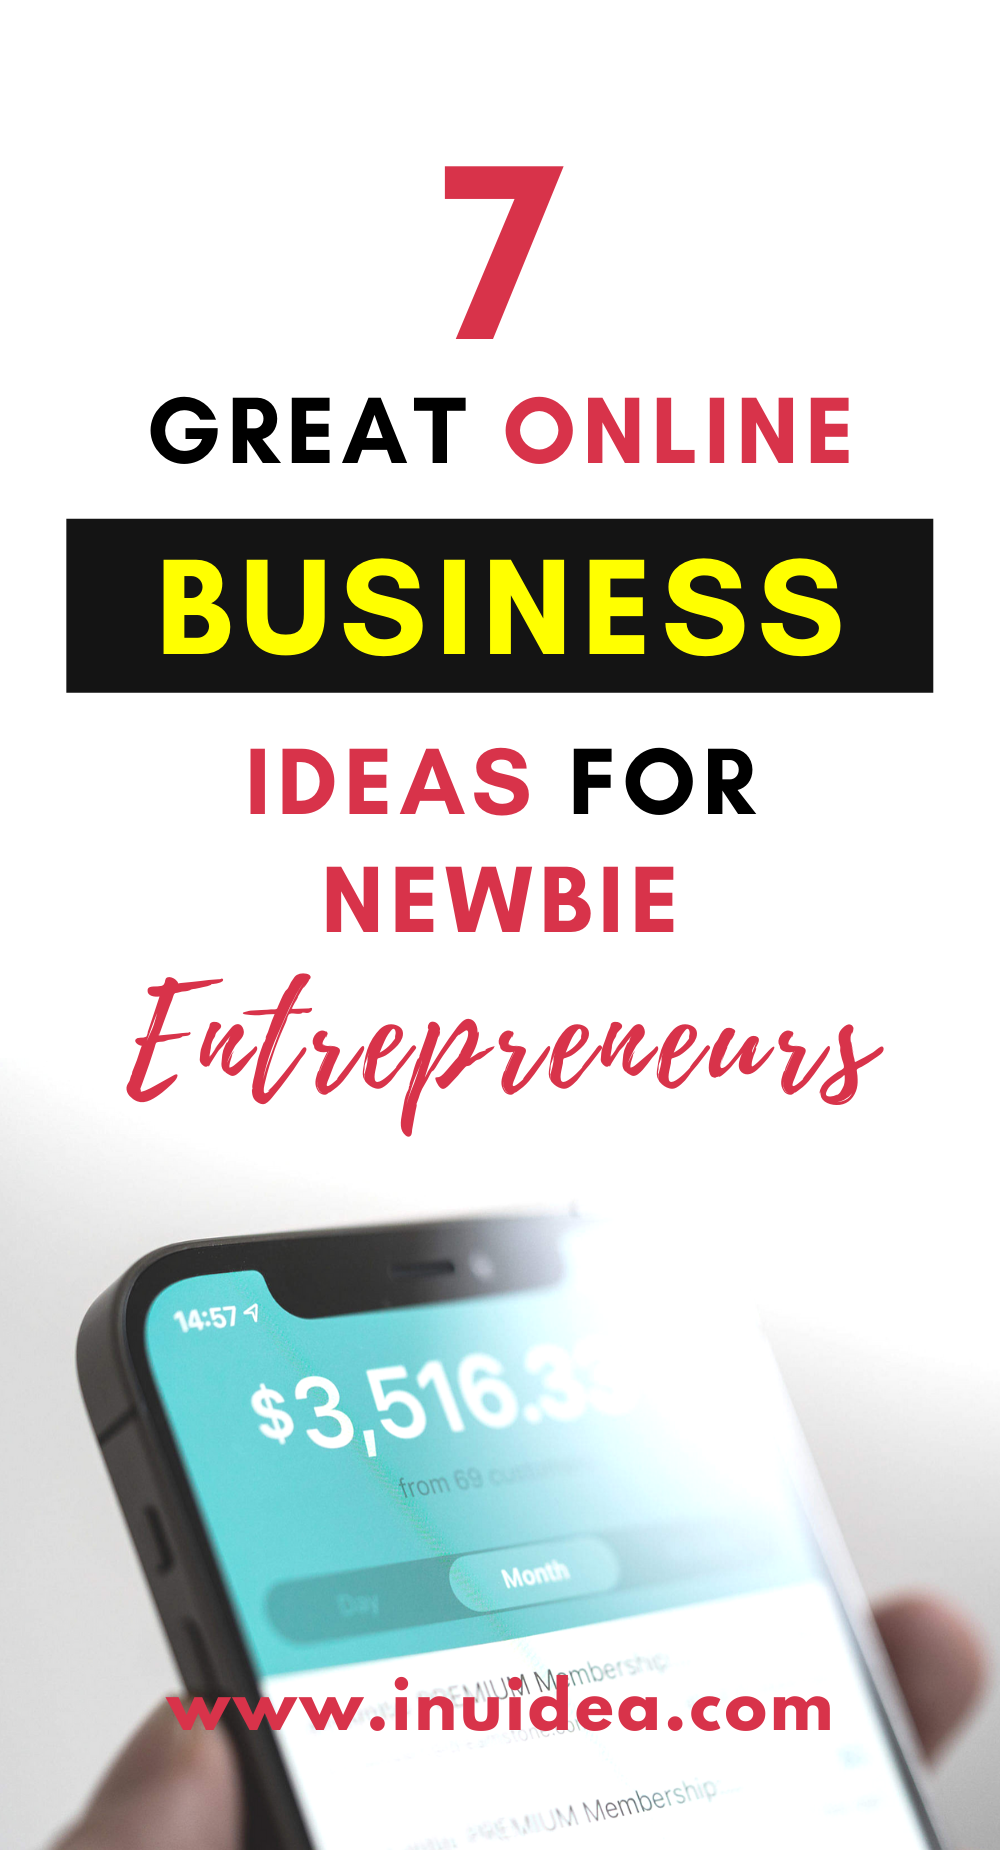 7 Great Online Business Ideas for Newbie Entrepreneurs in 2021